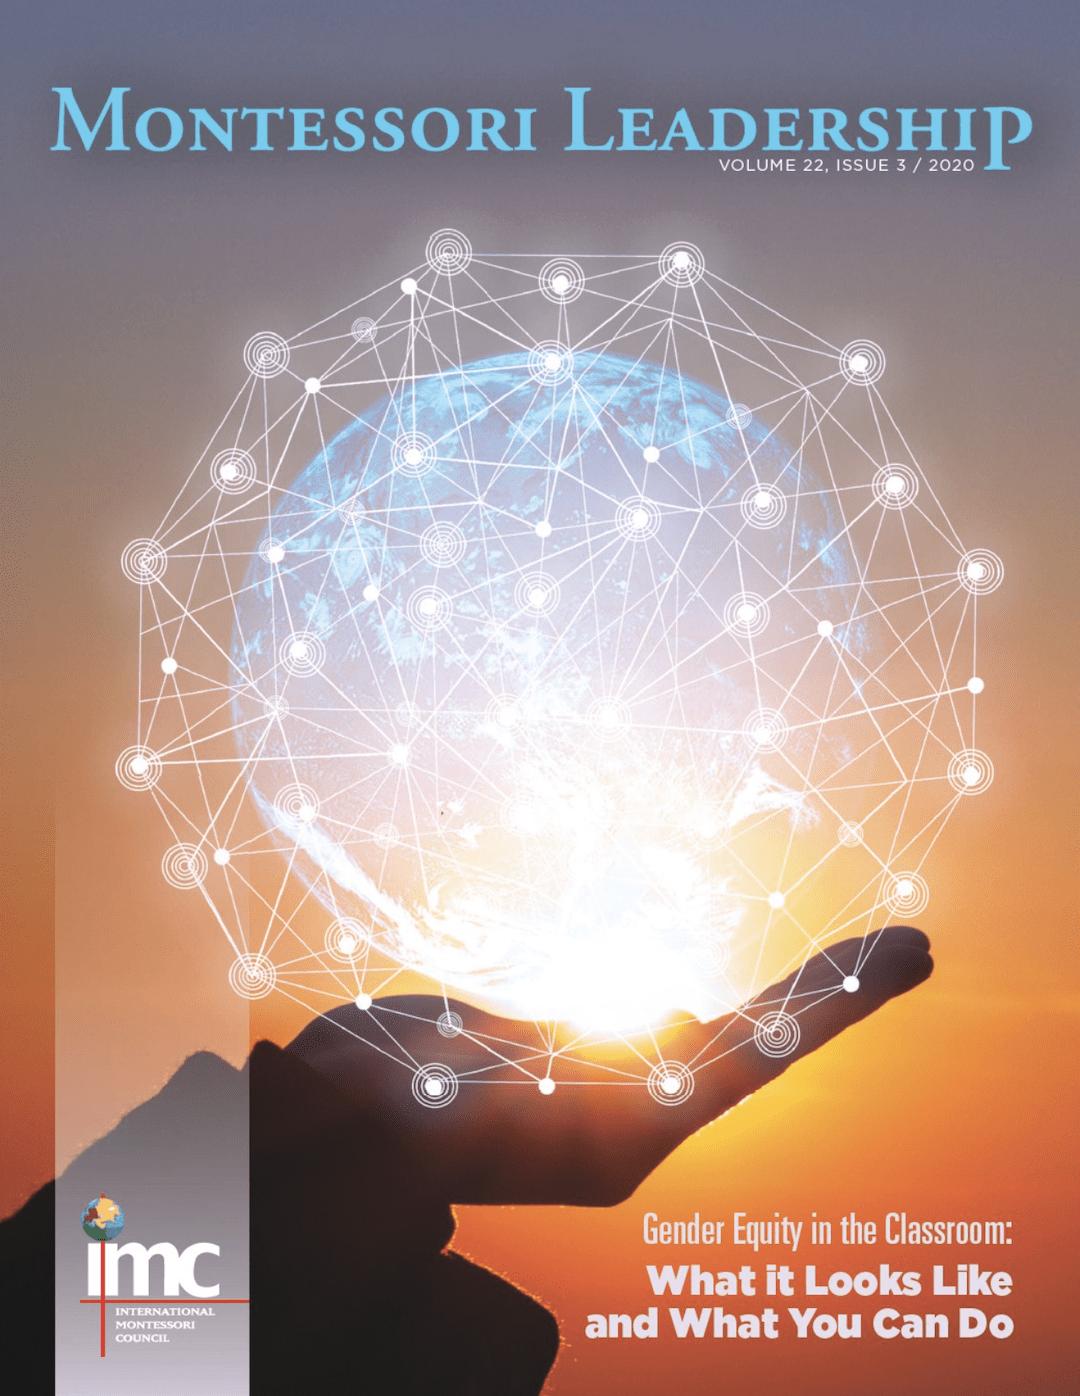 Montessori Leadership Magazine August-September 2020